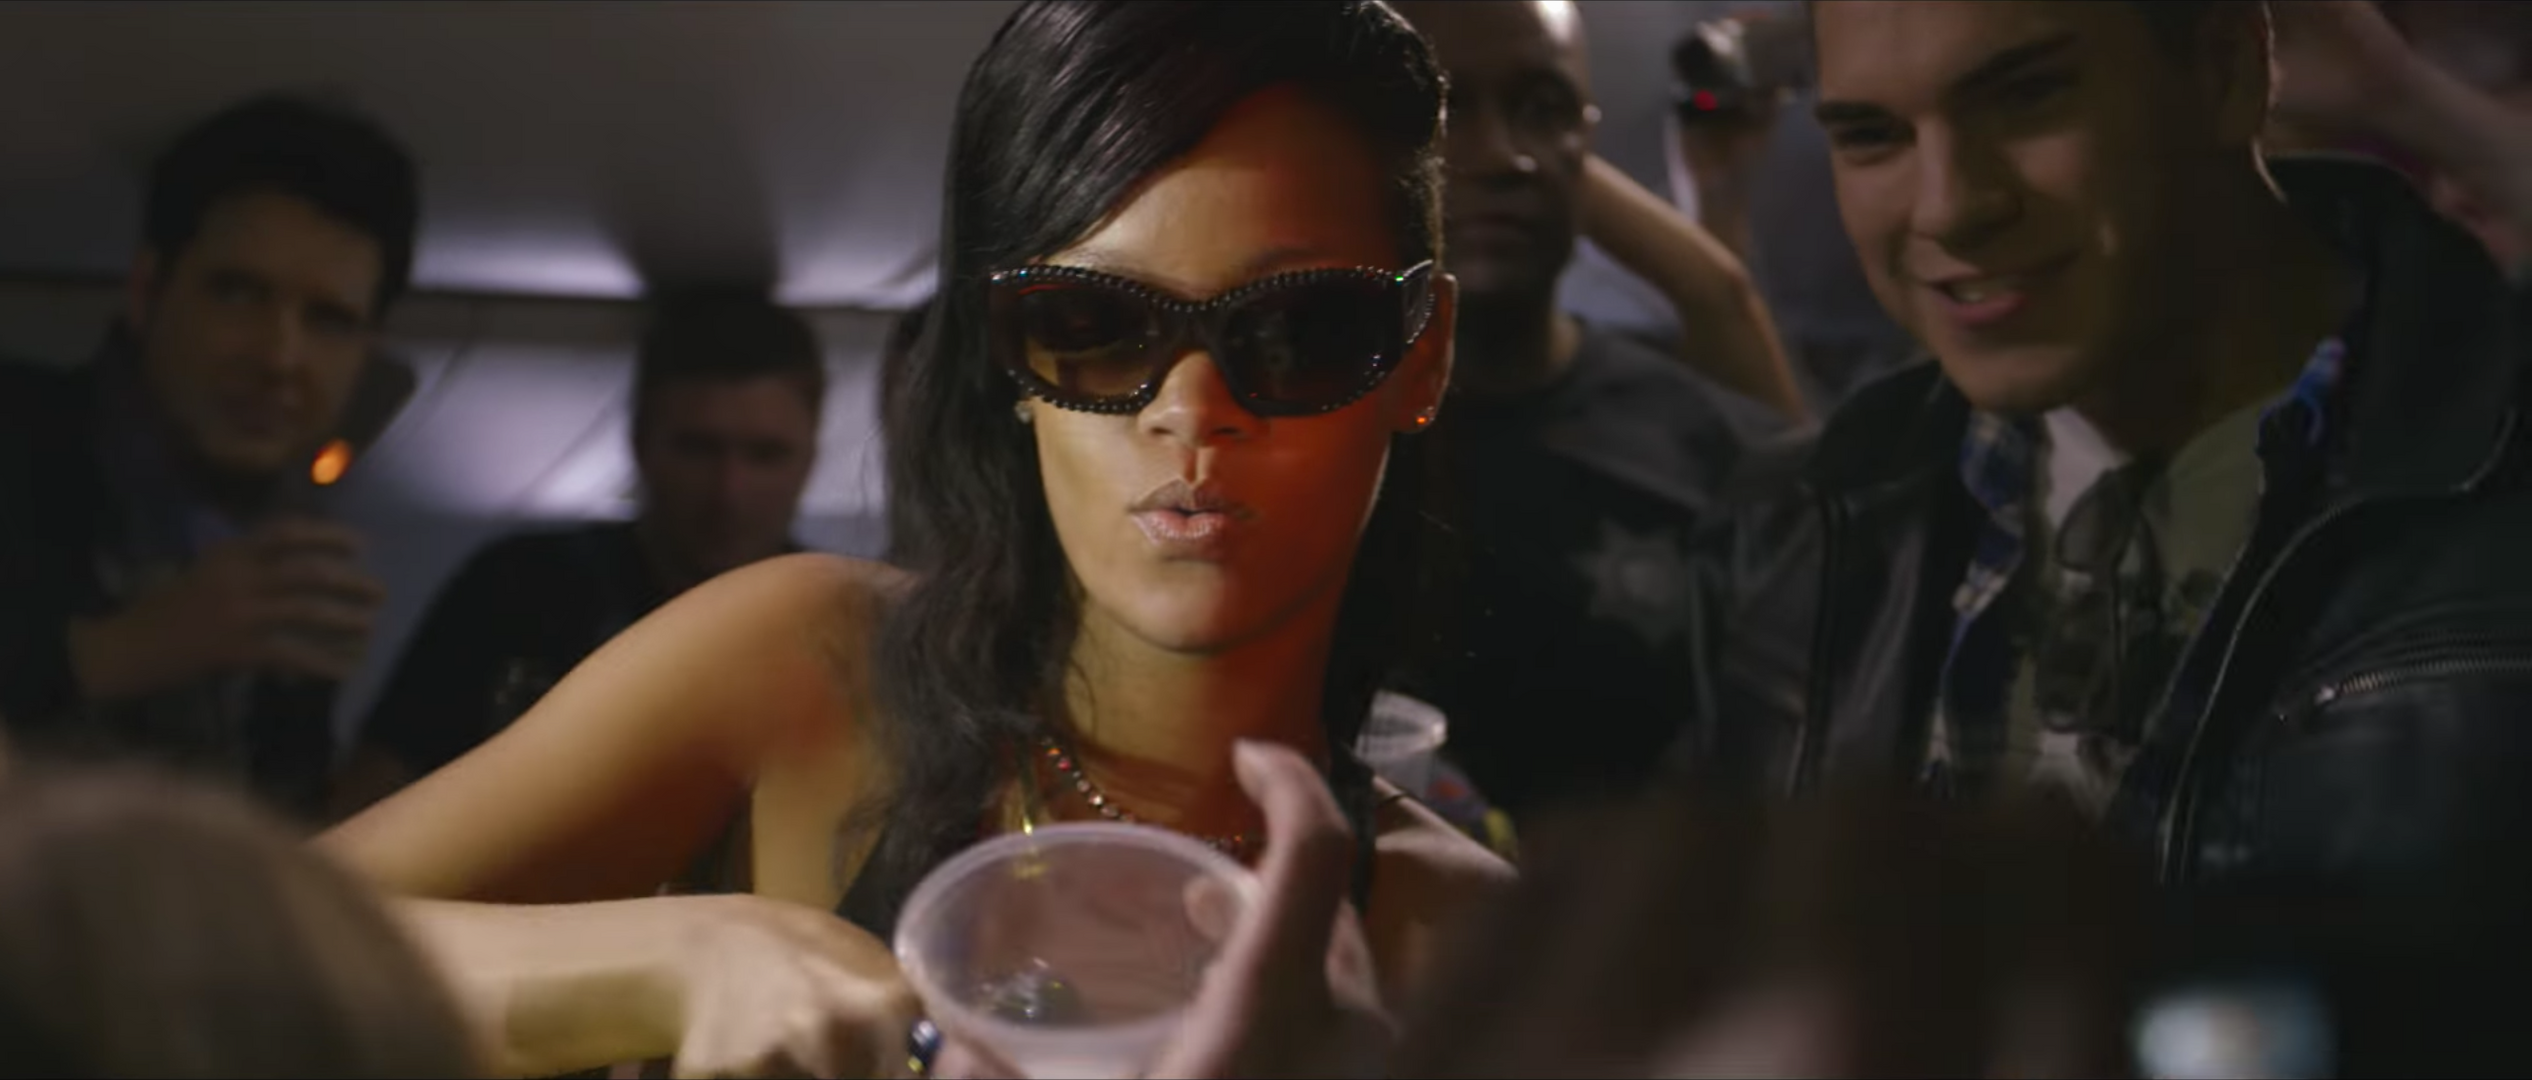 Rihanna4.png